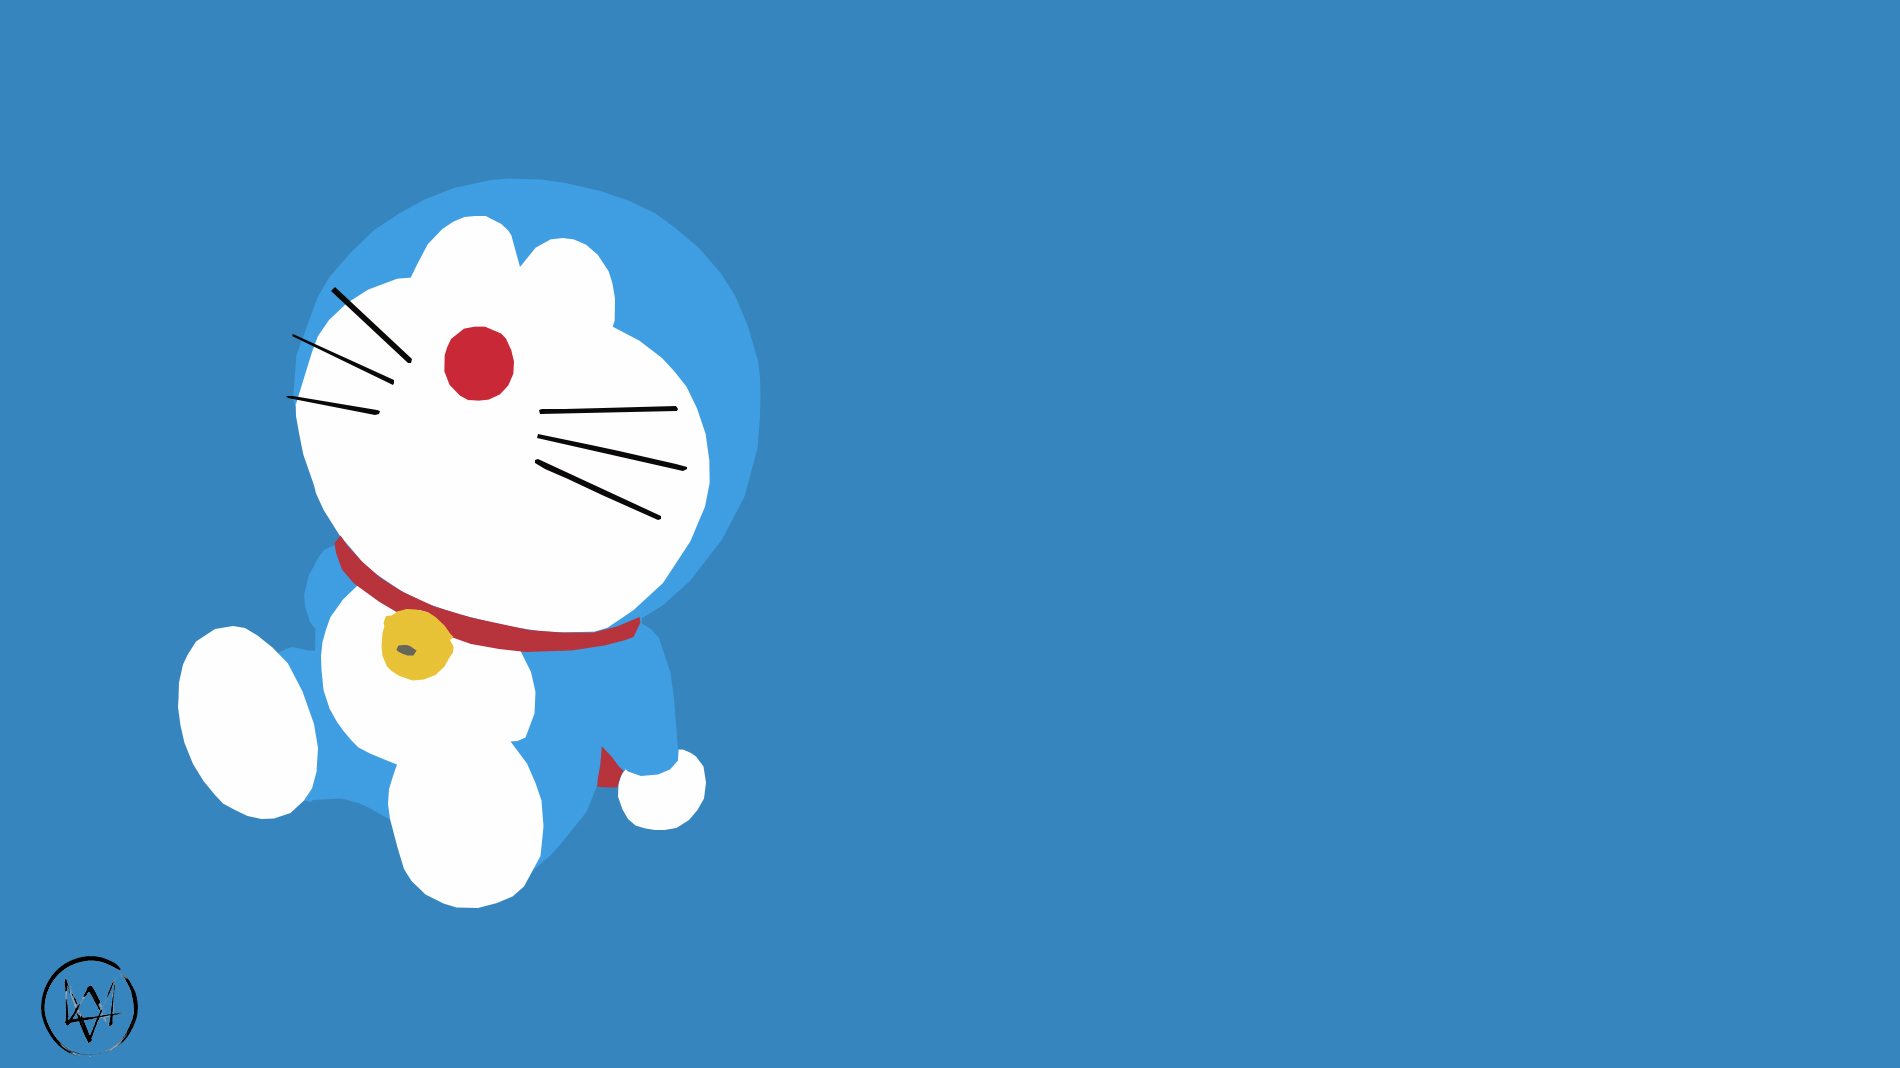 Download Cute Tweety Wallpapers Free Download Doraemon Backgrounds Pixelstalk Net